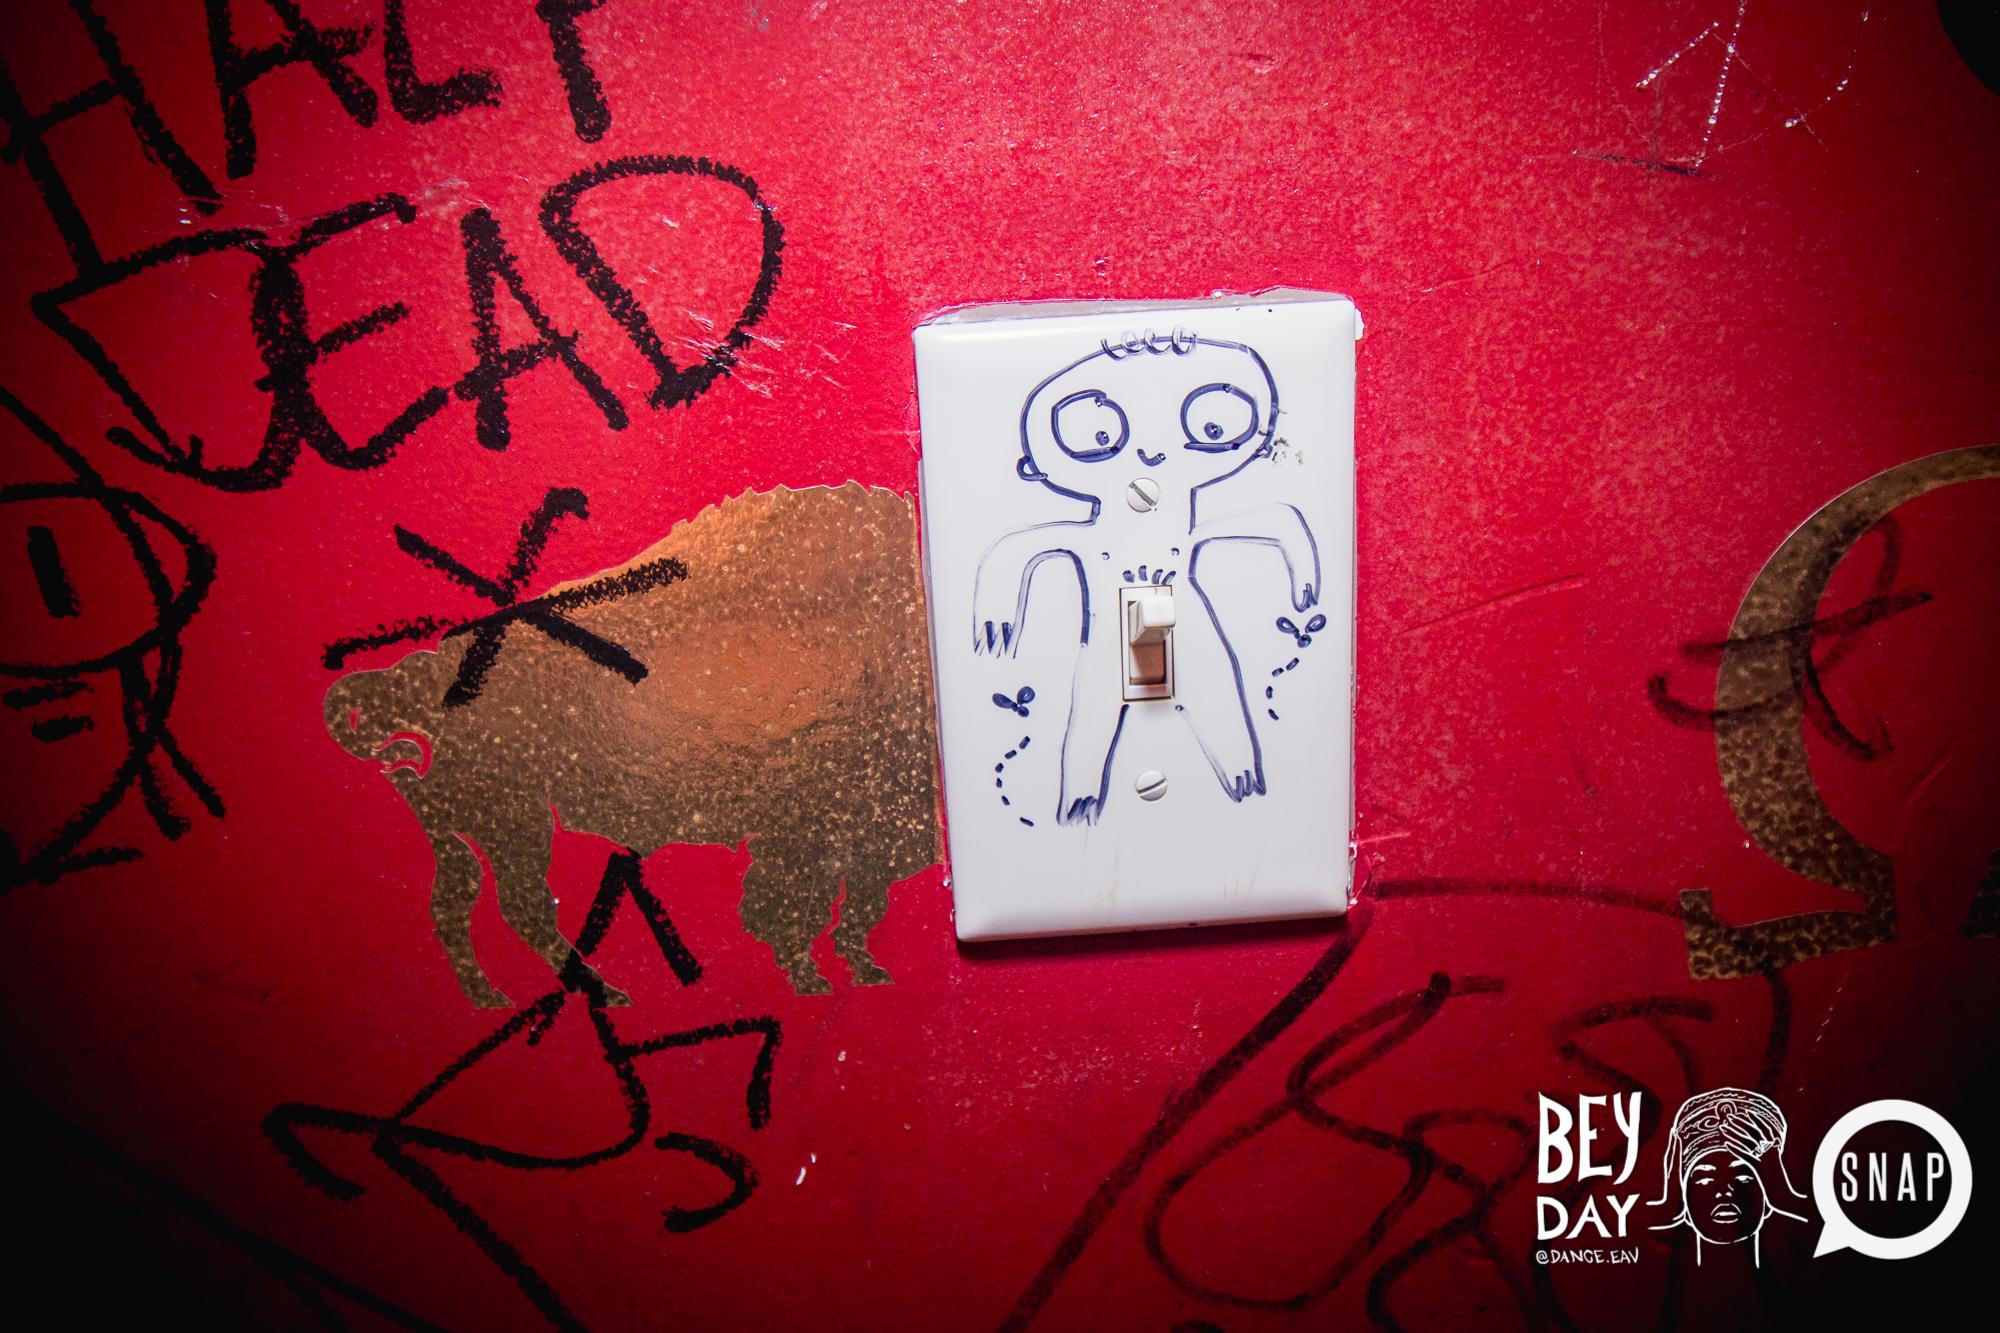 104Bey Day Grace Kelly The Basement Atlanta Oh Snap Kid.jpg